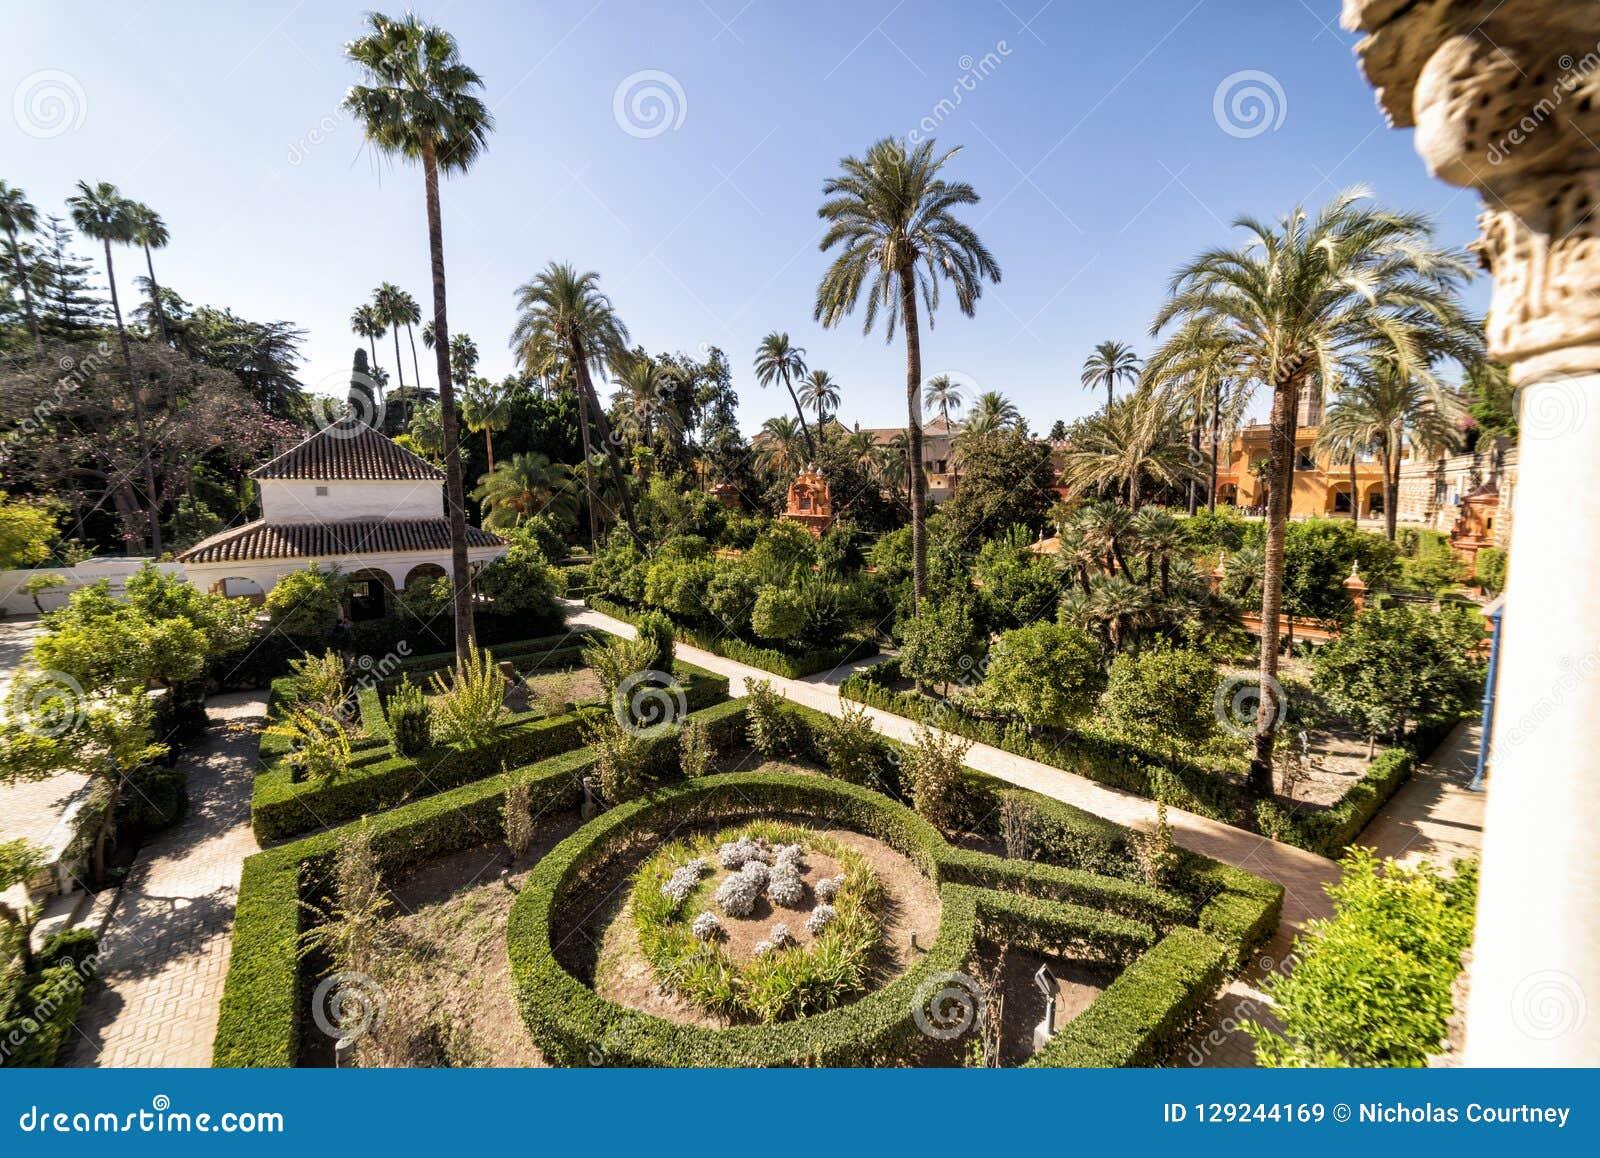 The gardens of the Royal Alcazar. Seville, Spain